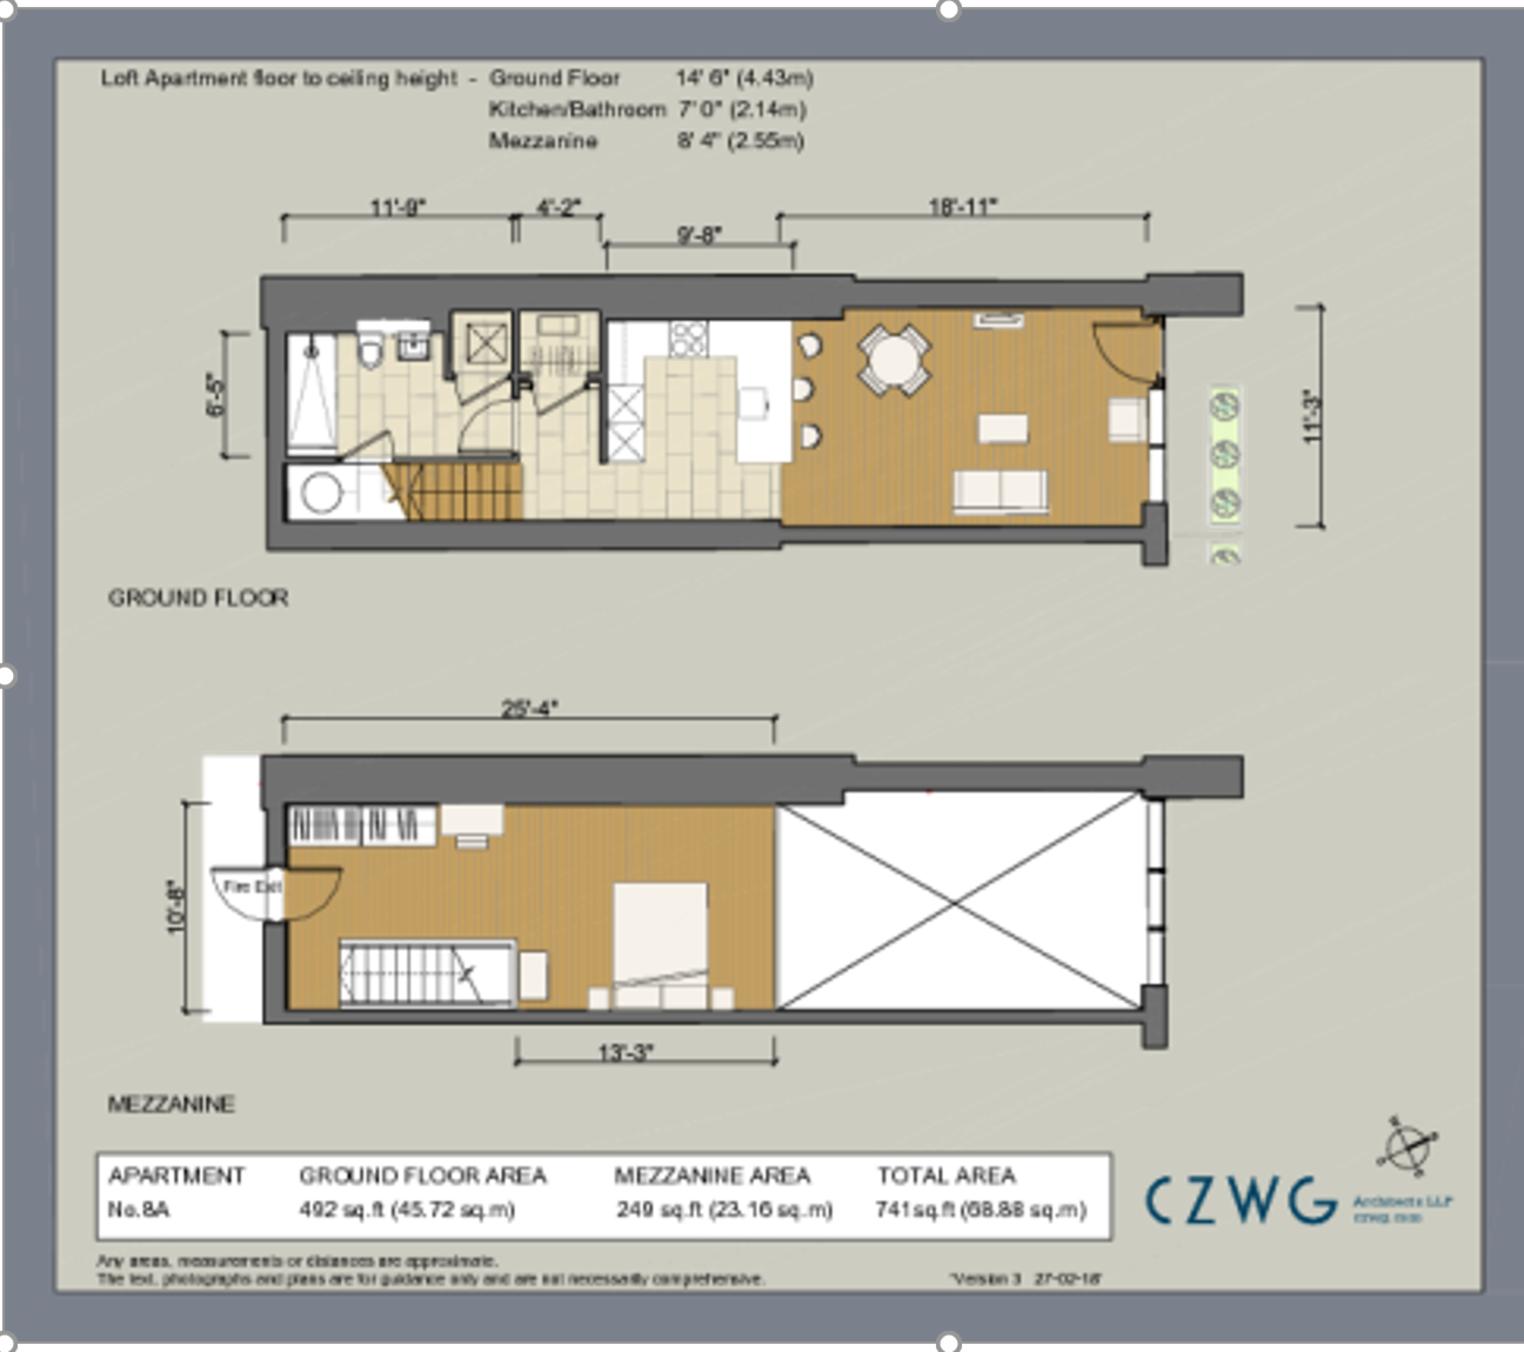 Floorplan for Eldridge Street Lofts